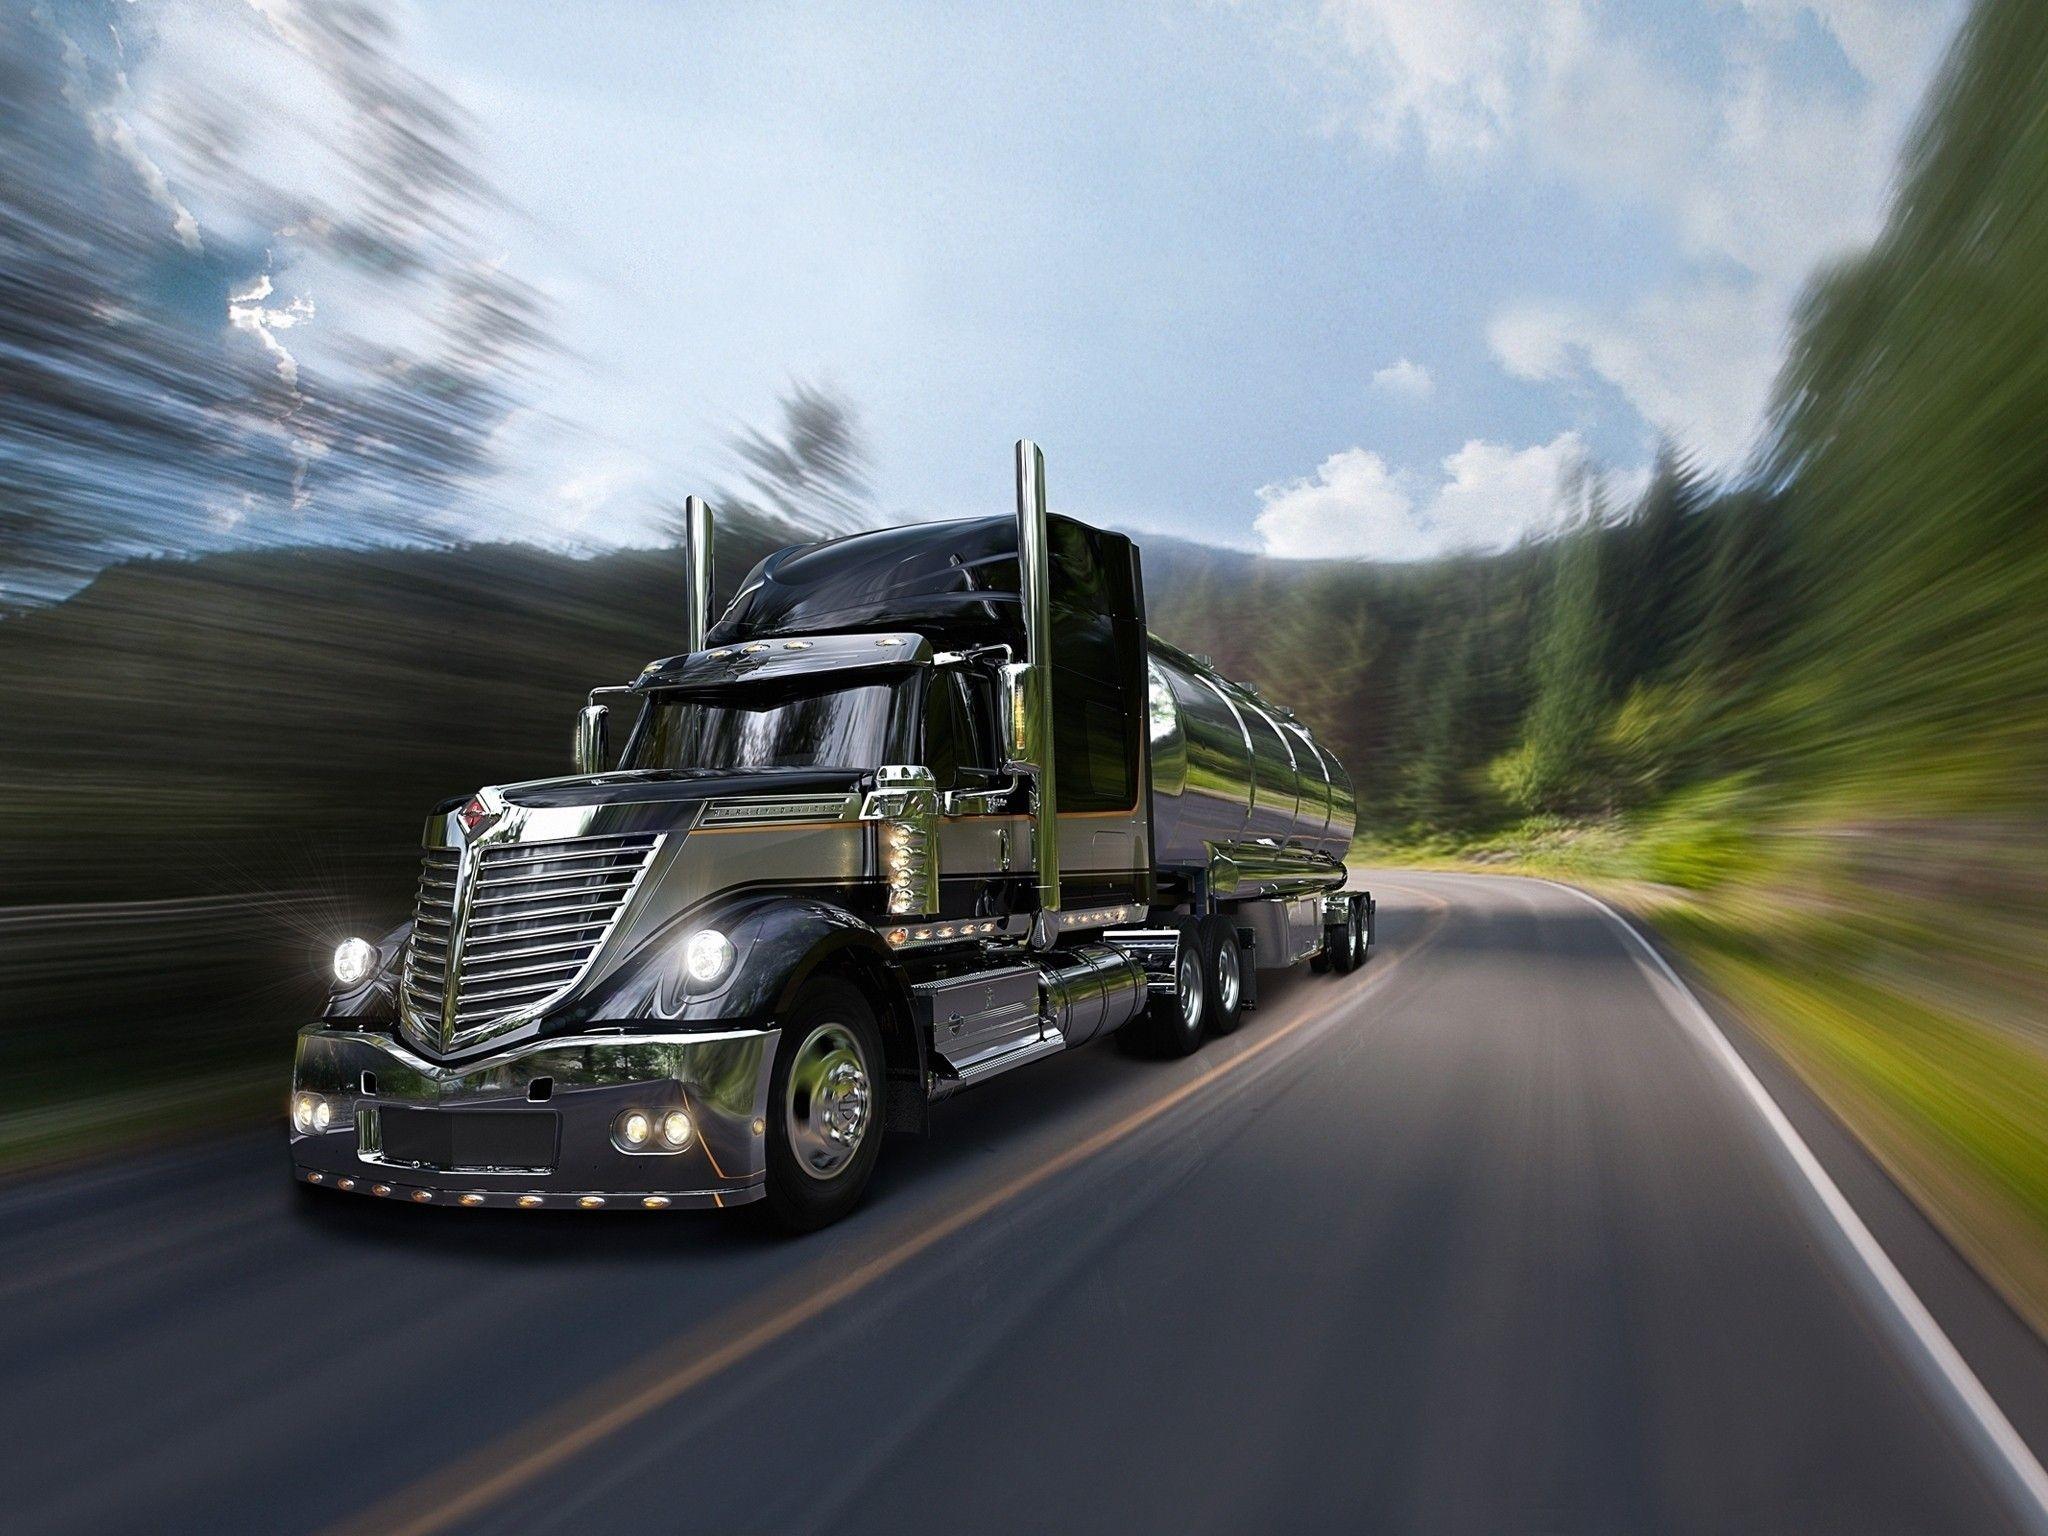 Volvo truck wallpapers high resolution | volvo truck | Pinterest | Volvo  trucks, Volvo and Semi trucks